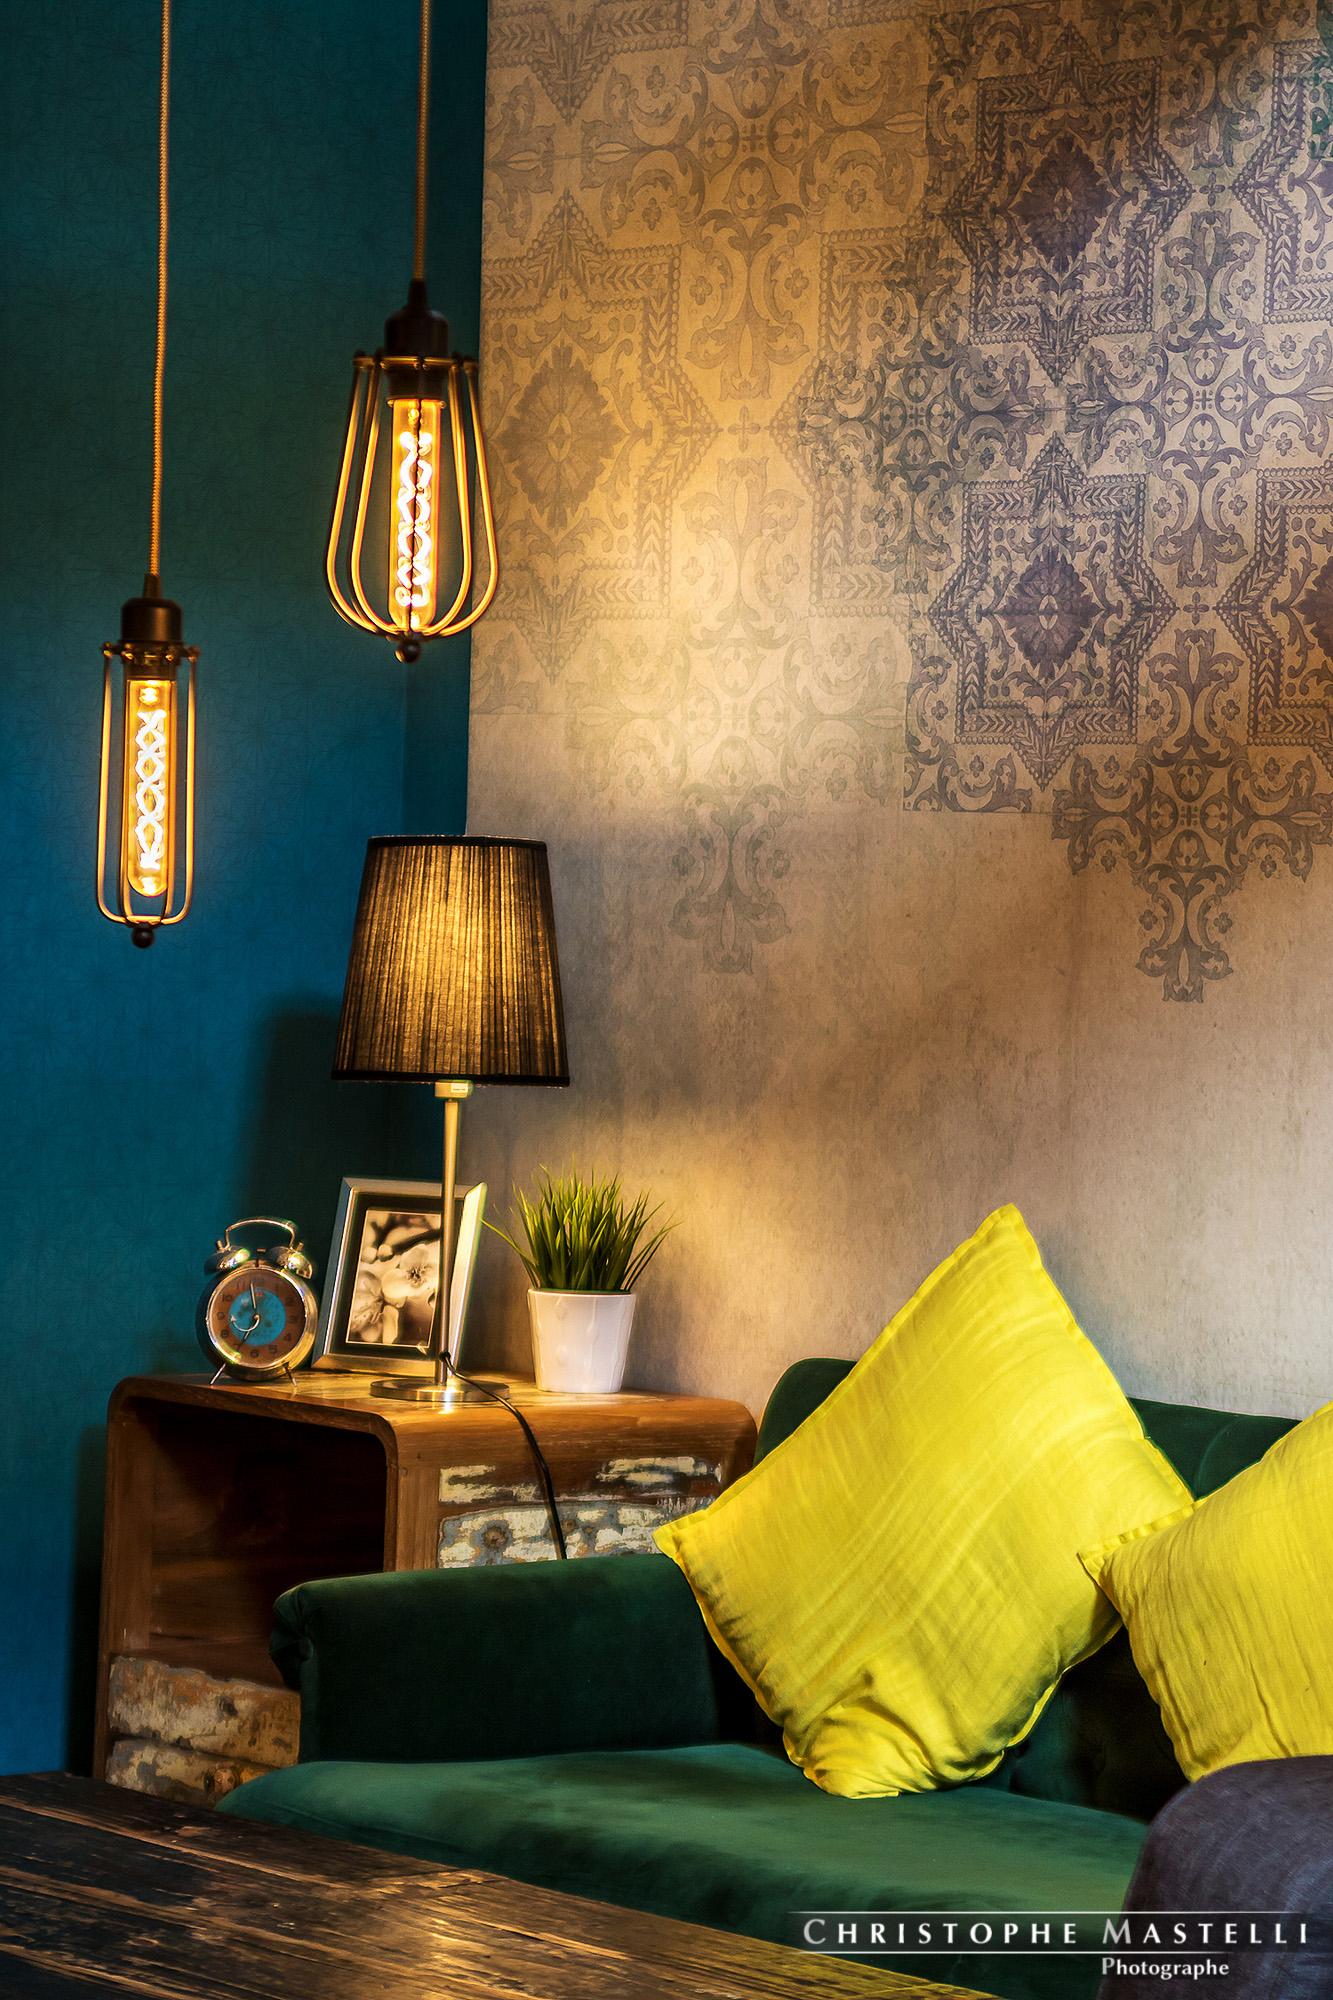 mugs 018 christophe mastelli photographe saint raphael restaurants immobilier hotel paca. Black Bedroom Furniture Sets. Home Design Ideas